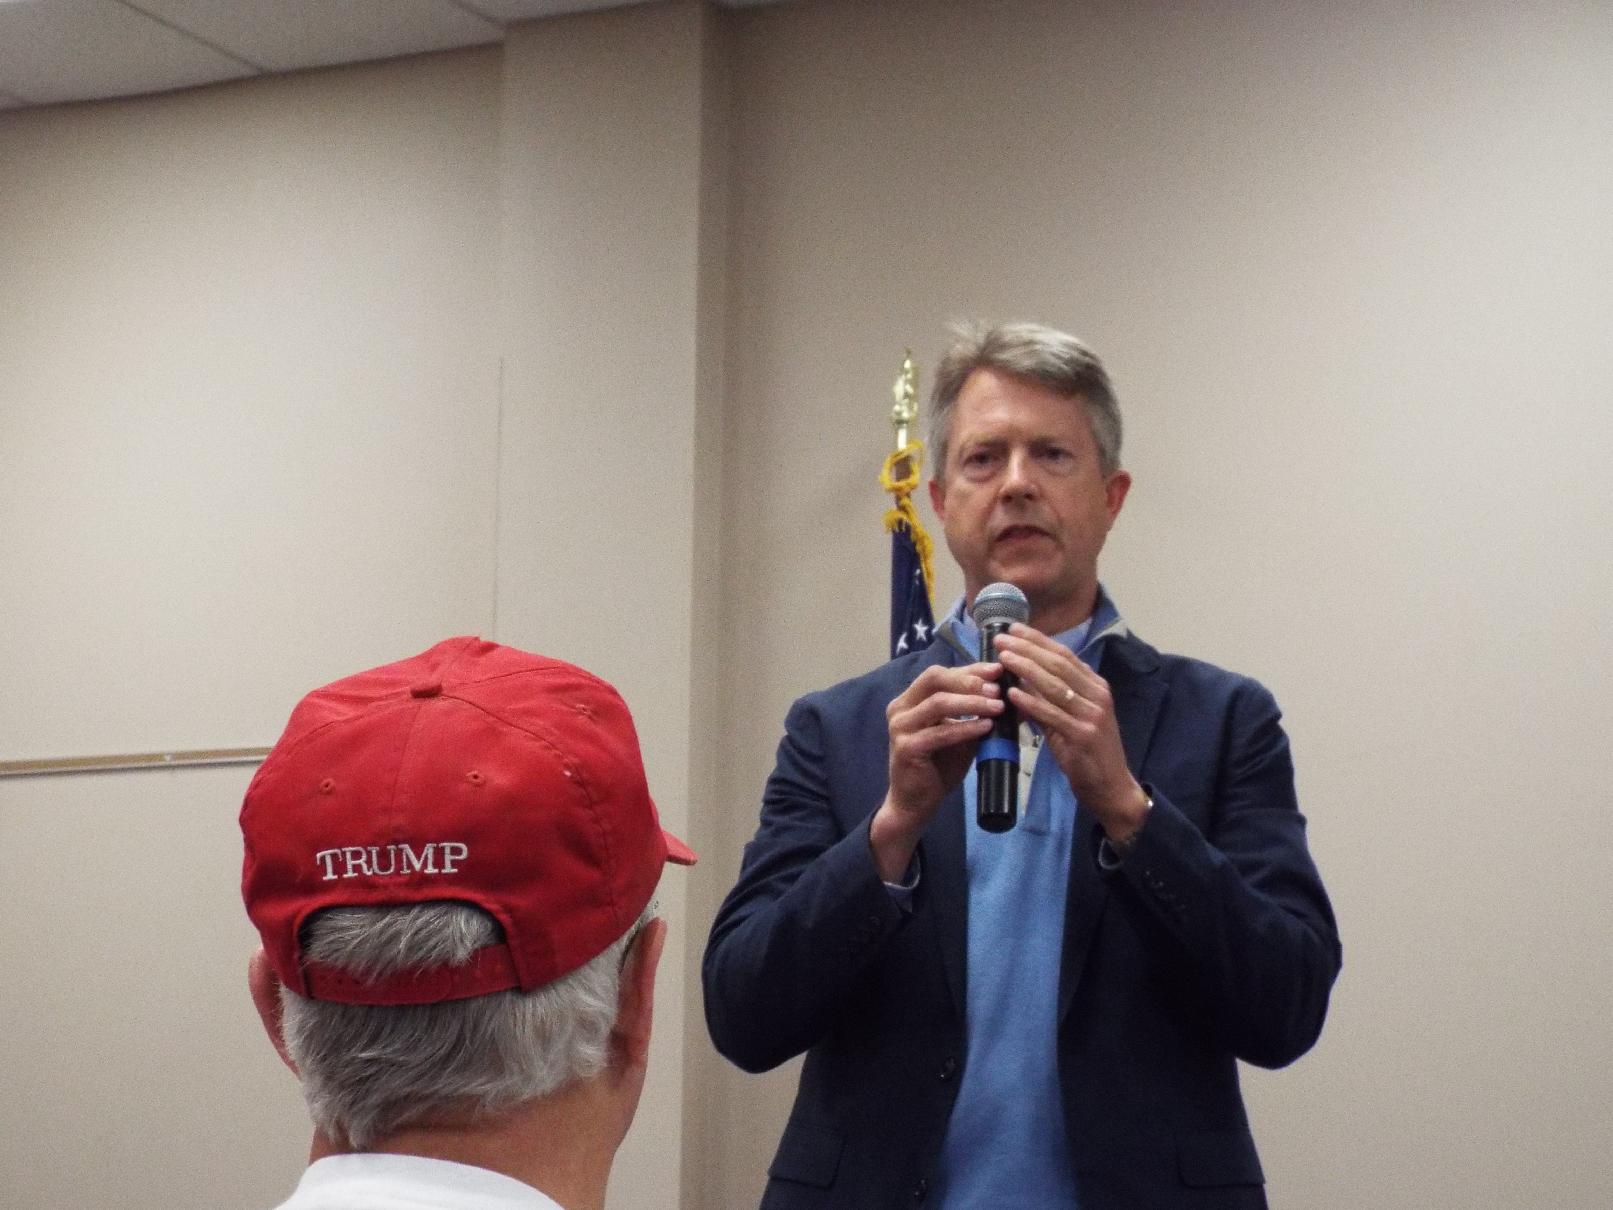 Kansas Congressman Not Involved in Shooting